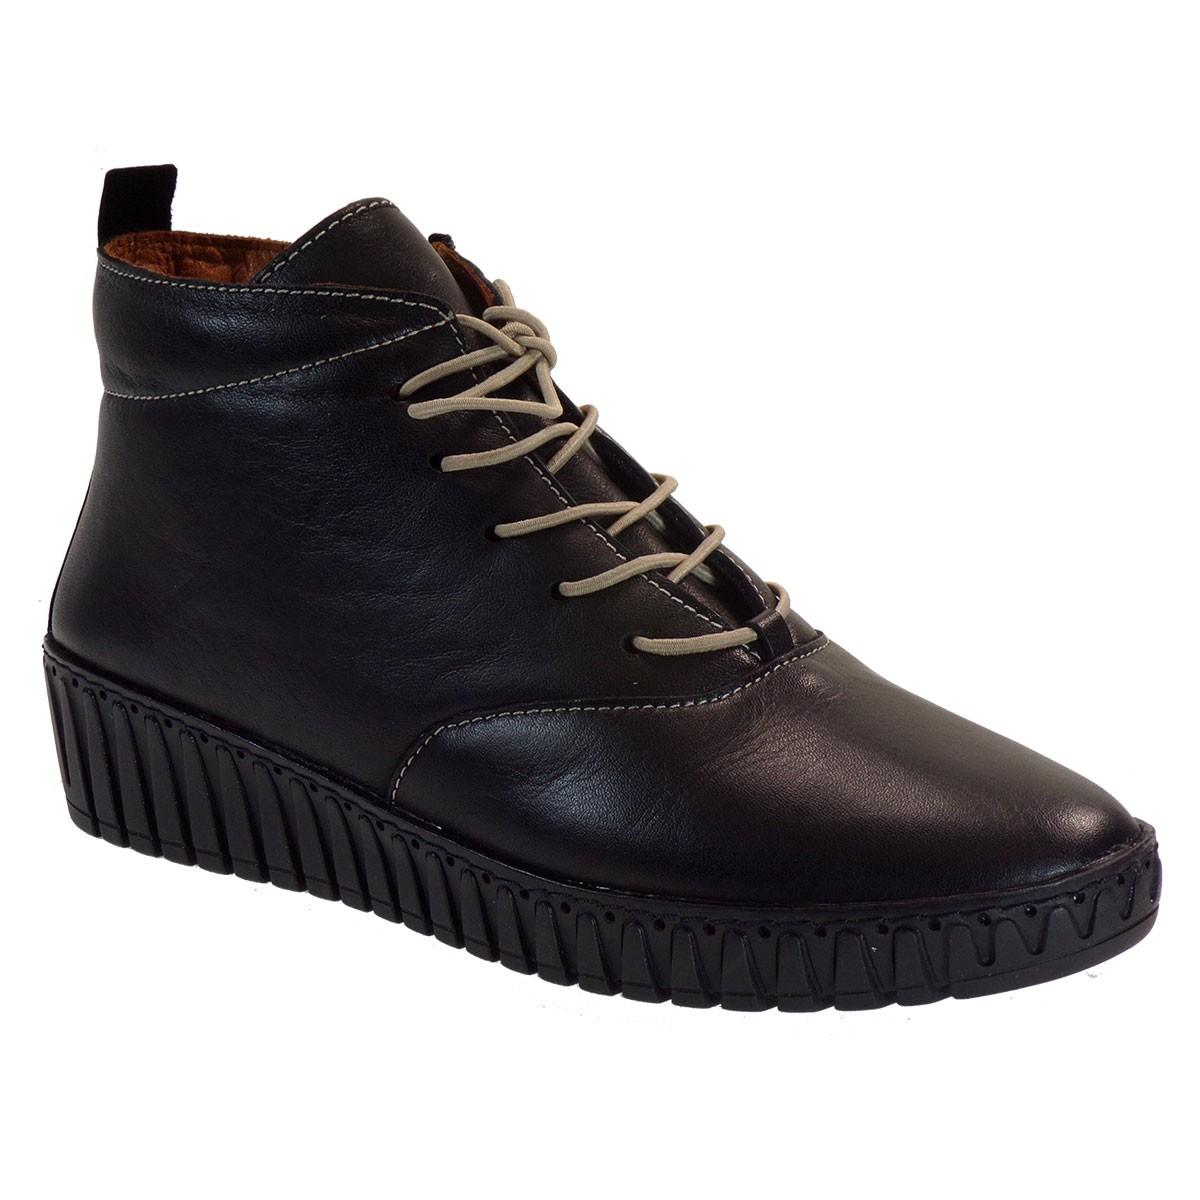 VEROSOFT Γυναικεία Παπούτσια Μποτάκια Αστραγάλου 398-405 Μαύρο Δέρμα 868291803